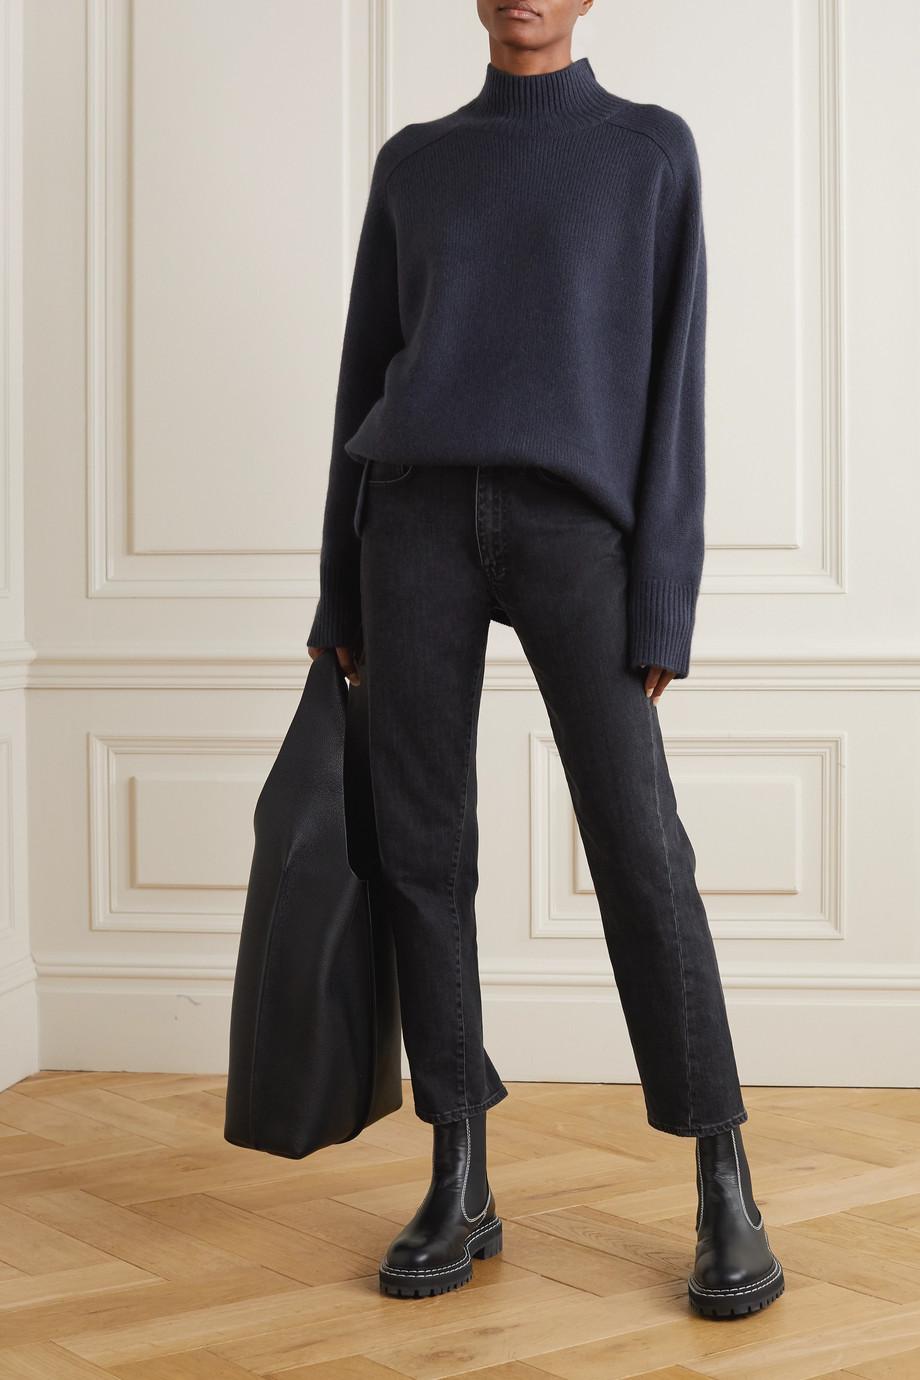 Arch4 Edith cashmere turtleneck sweater